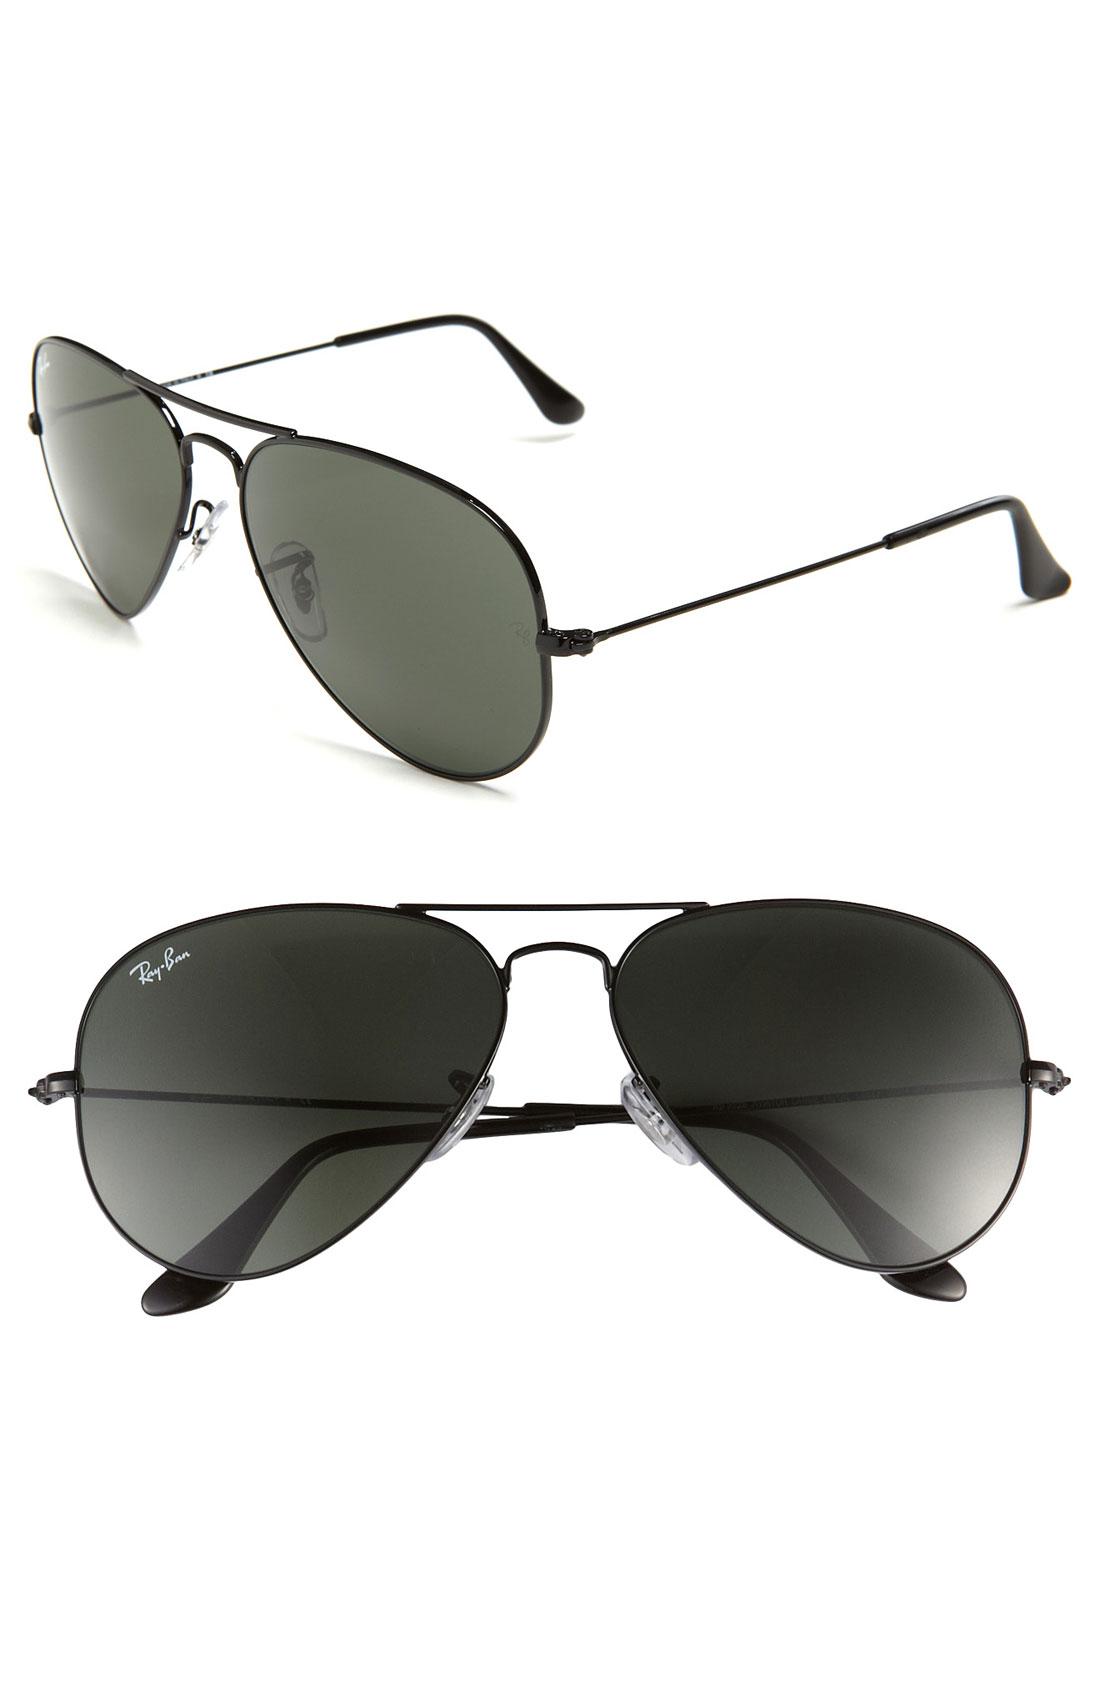 a38d6dd85d5 Ray Ban Original Aviator 58mm Sunglasses « Heritage Malta